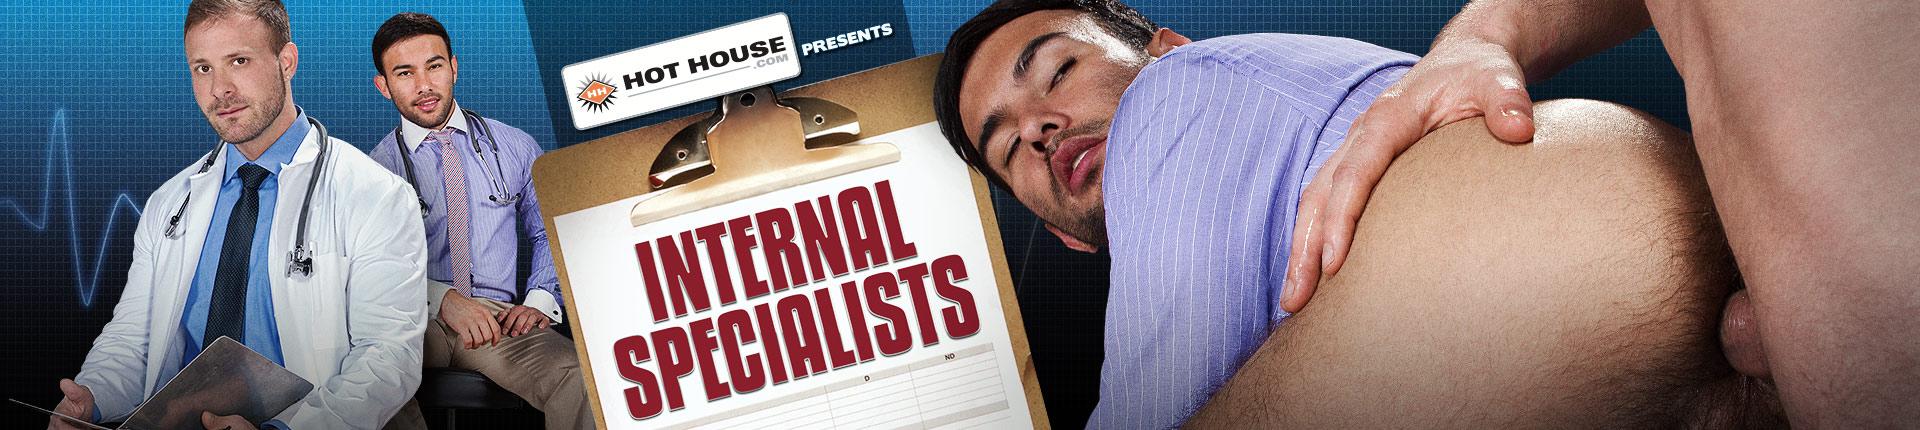 INTERNAL SPECIALISTS